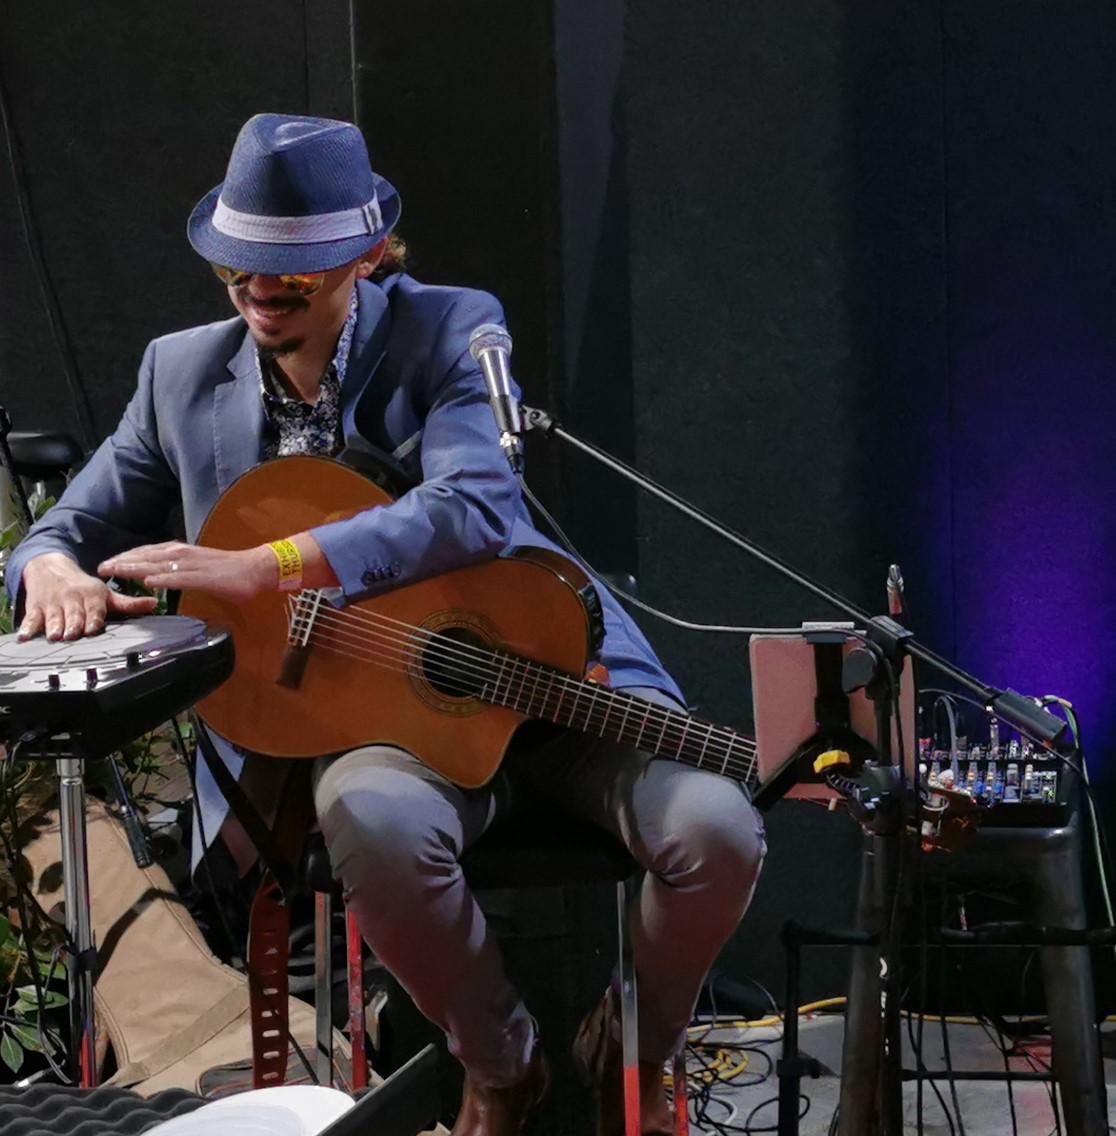 Ricky de Medeiros Latin Guitar Player